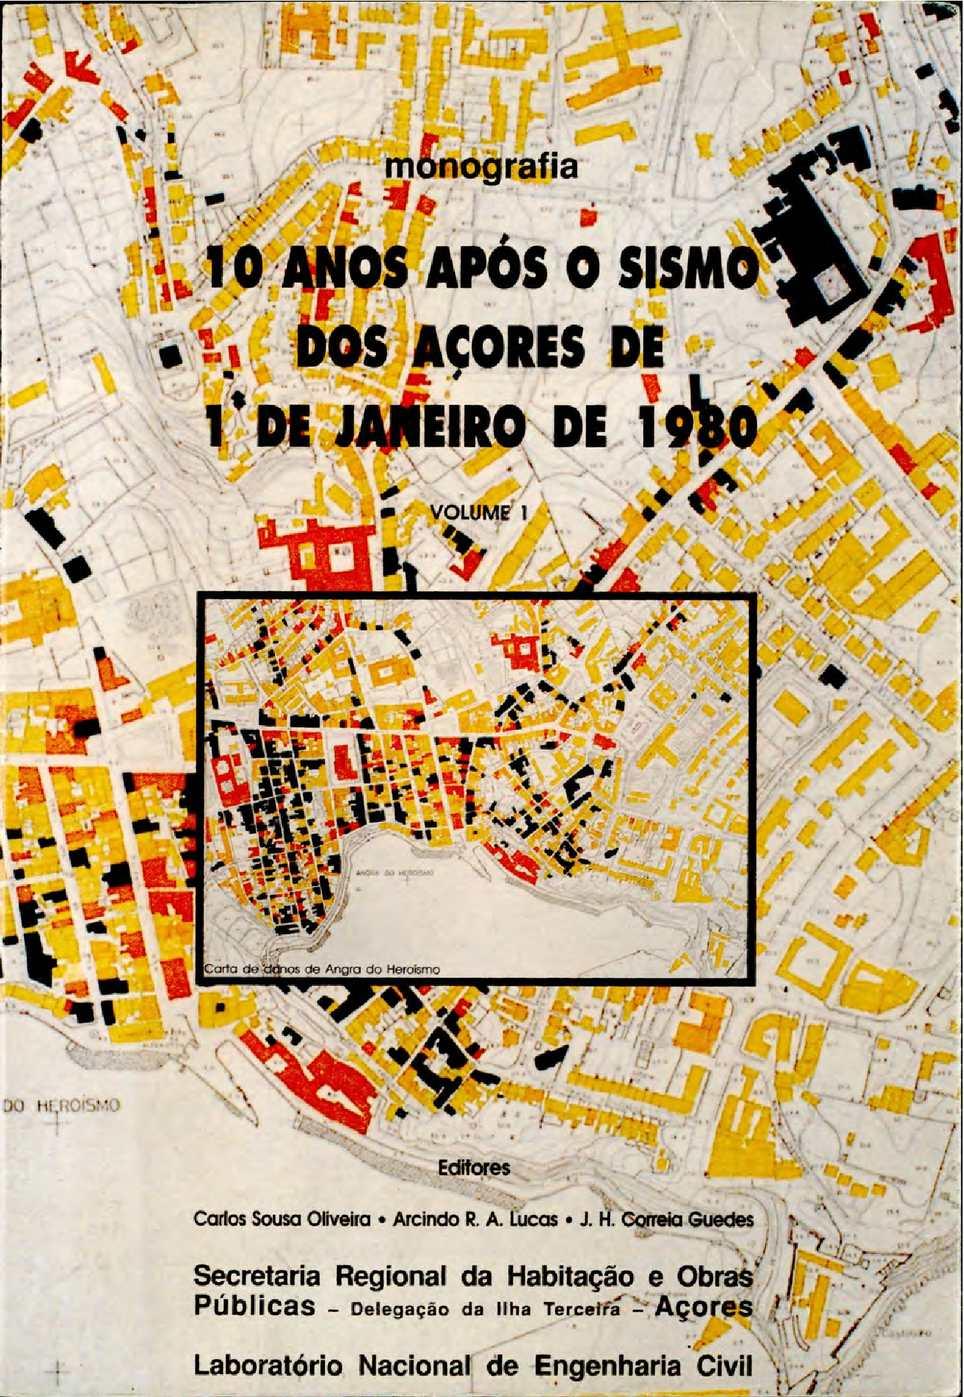 7883ea9b5 Calaméo - Monografia 10 anos após o sismo de 1-01-1980 - Volume I